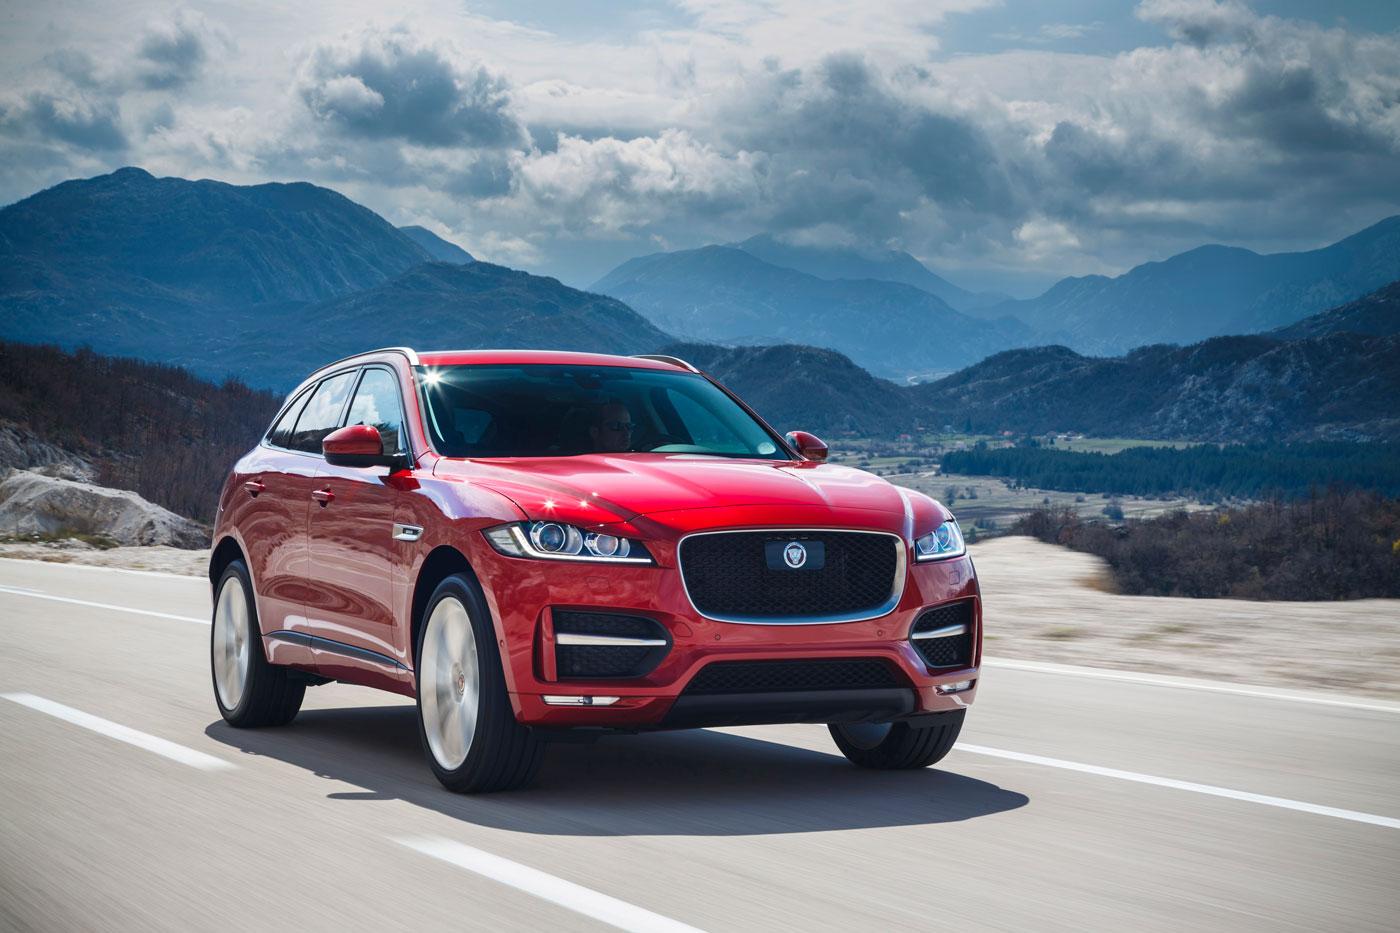 H Jaguar F-Pace στους φιναλίστ για τα βραβεία World Car of the Year και World Car Design of the Year στα World Car Awards 2017.